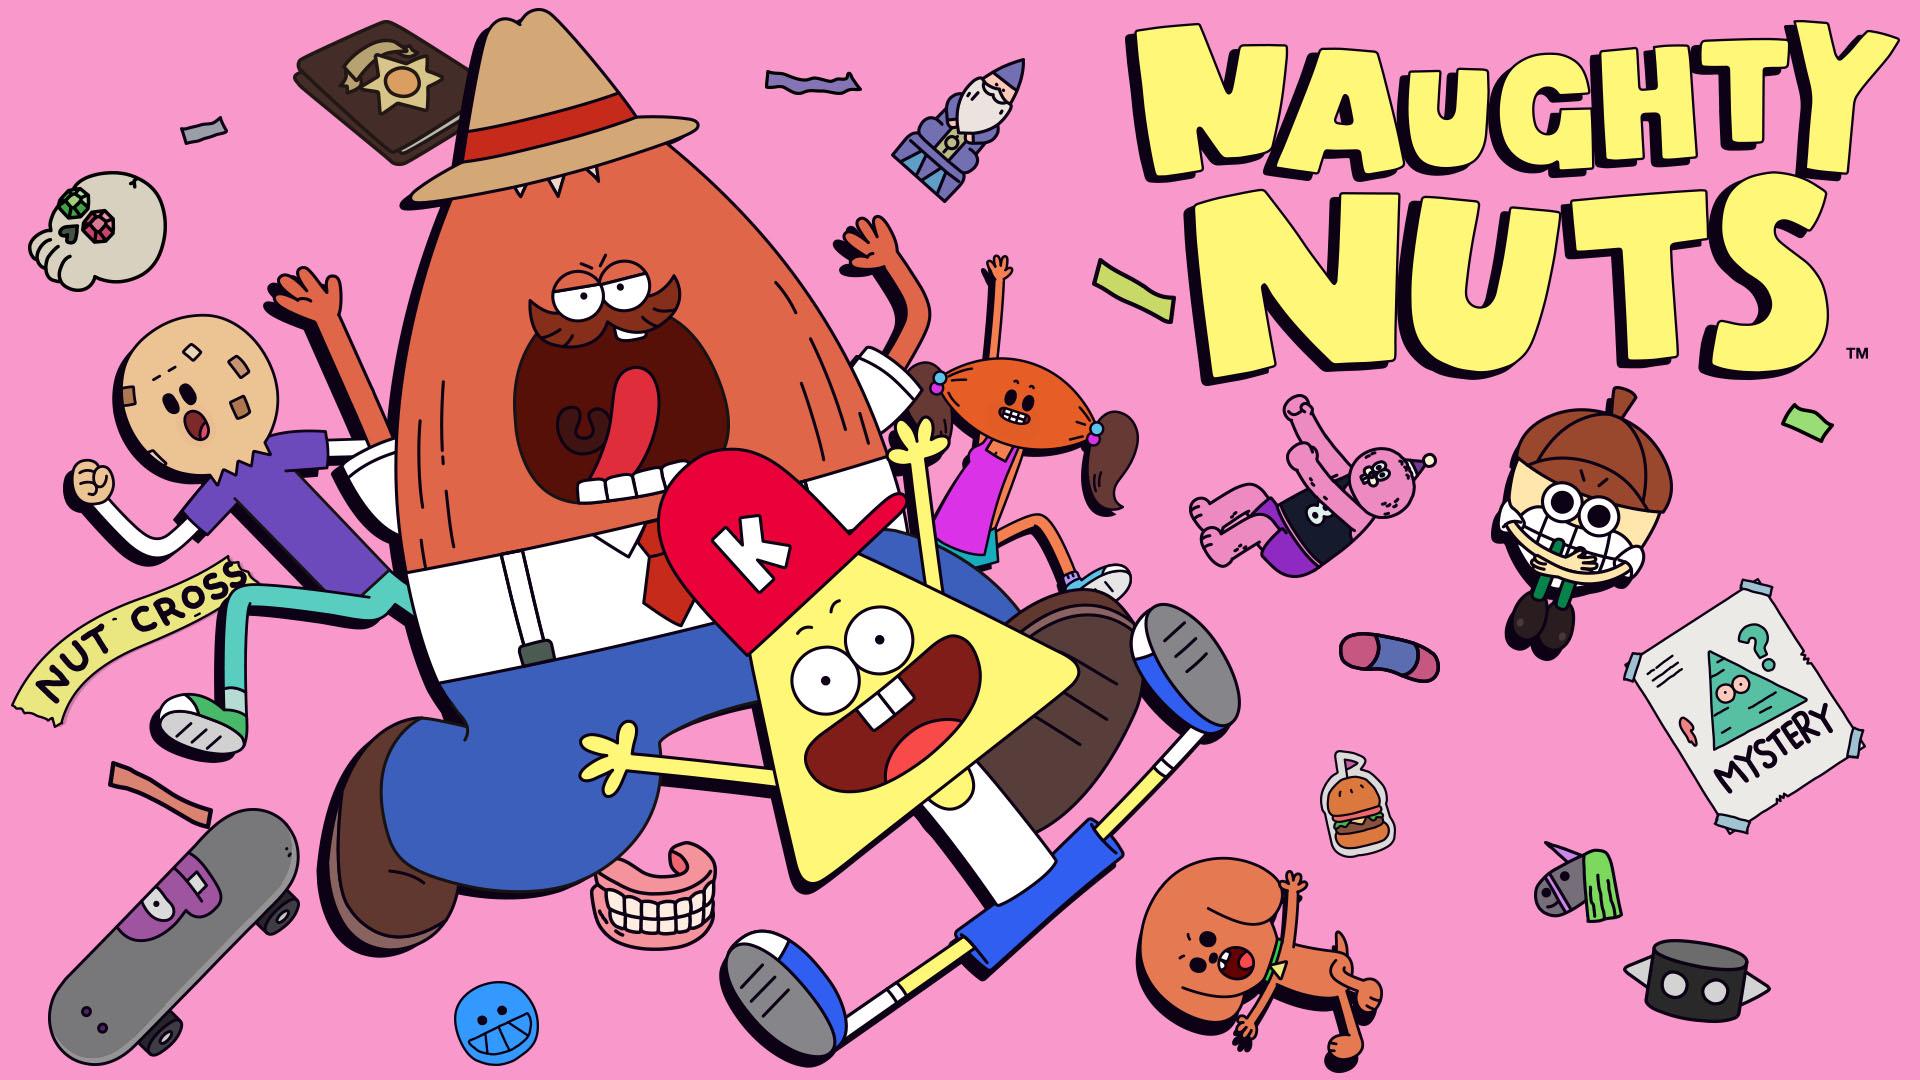 Naughty Nuts